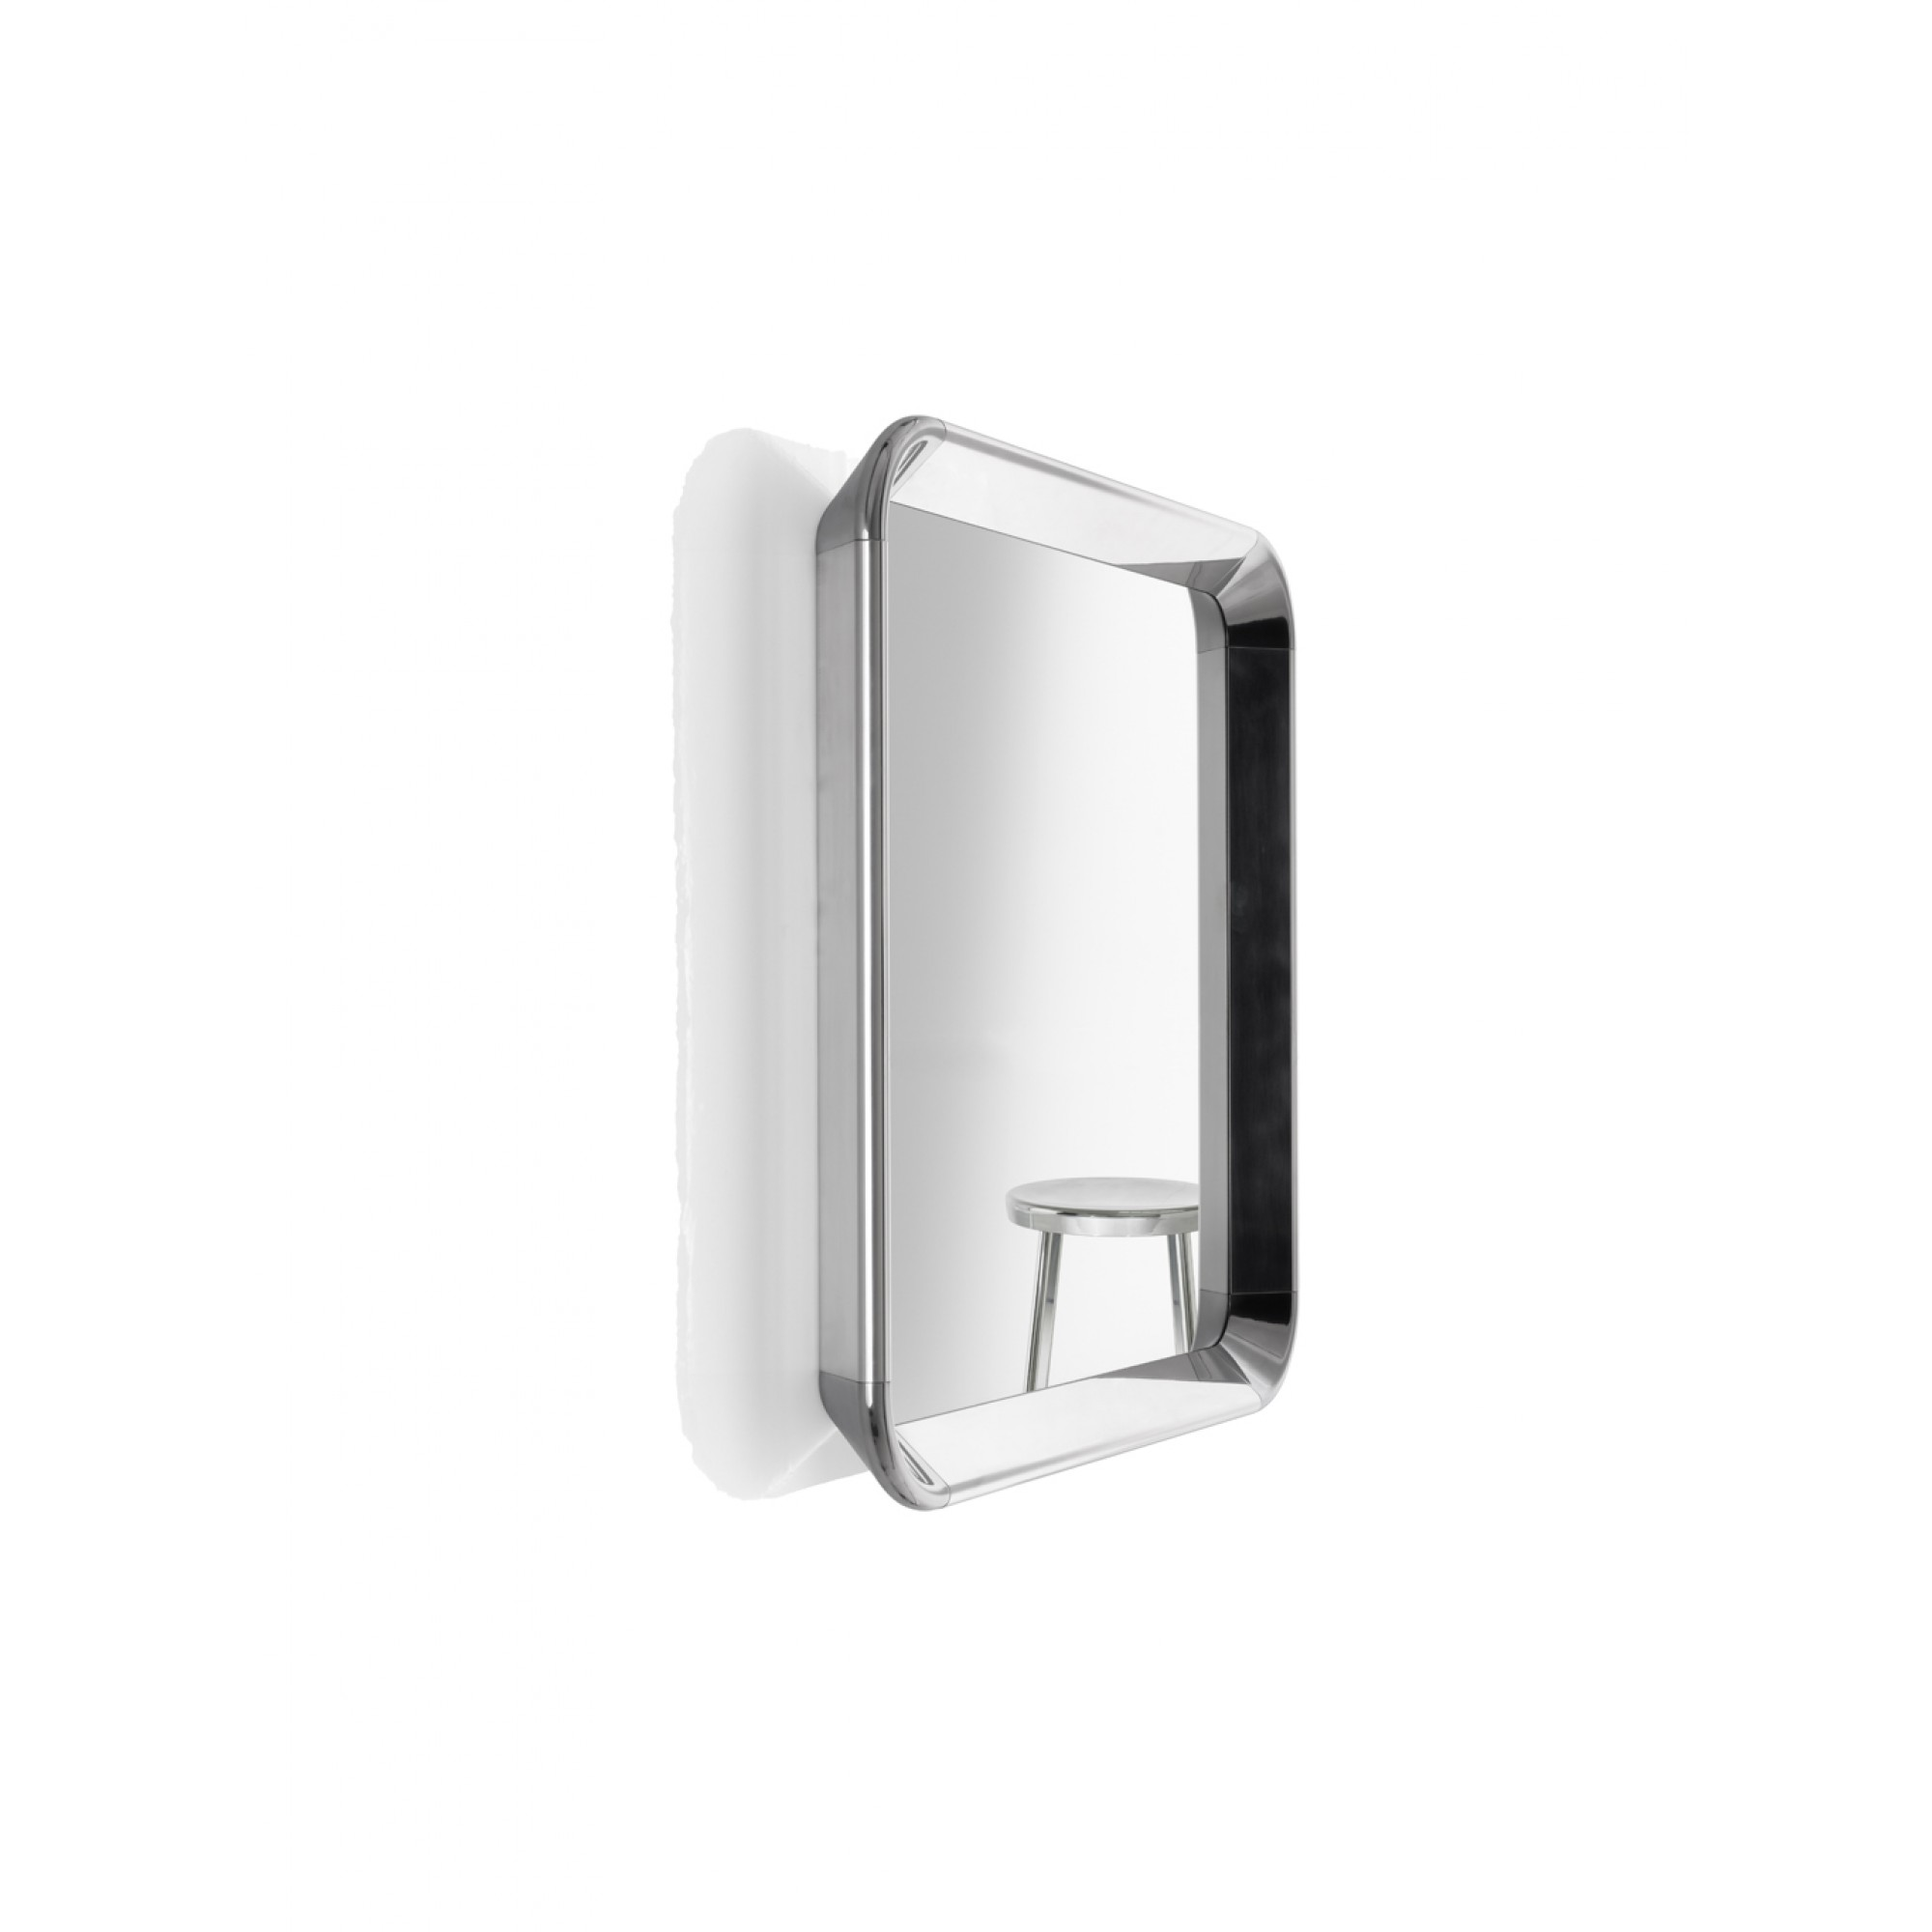 Deja Vu Mirror Mirrors Accessories Magis Masonionline